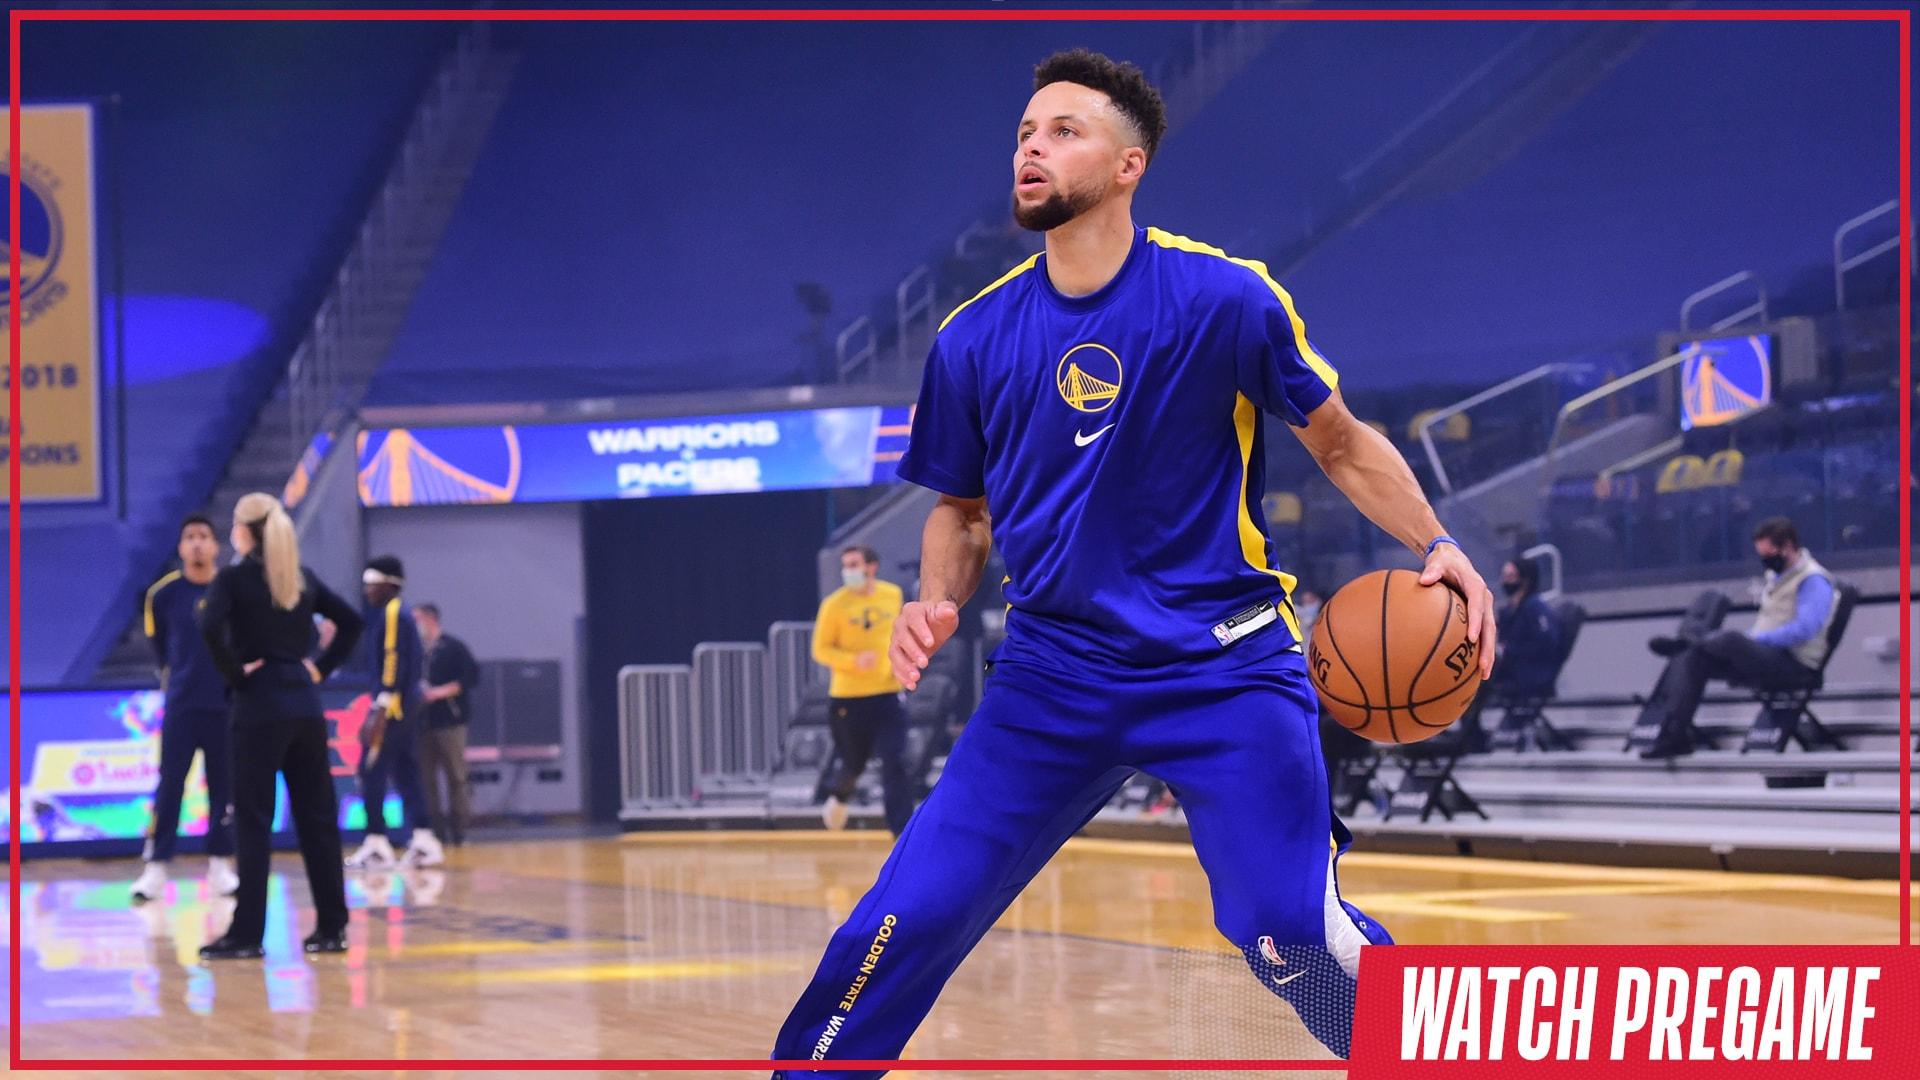 Watch Free: Spurs vs. Warriors Pregame